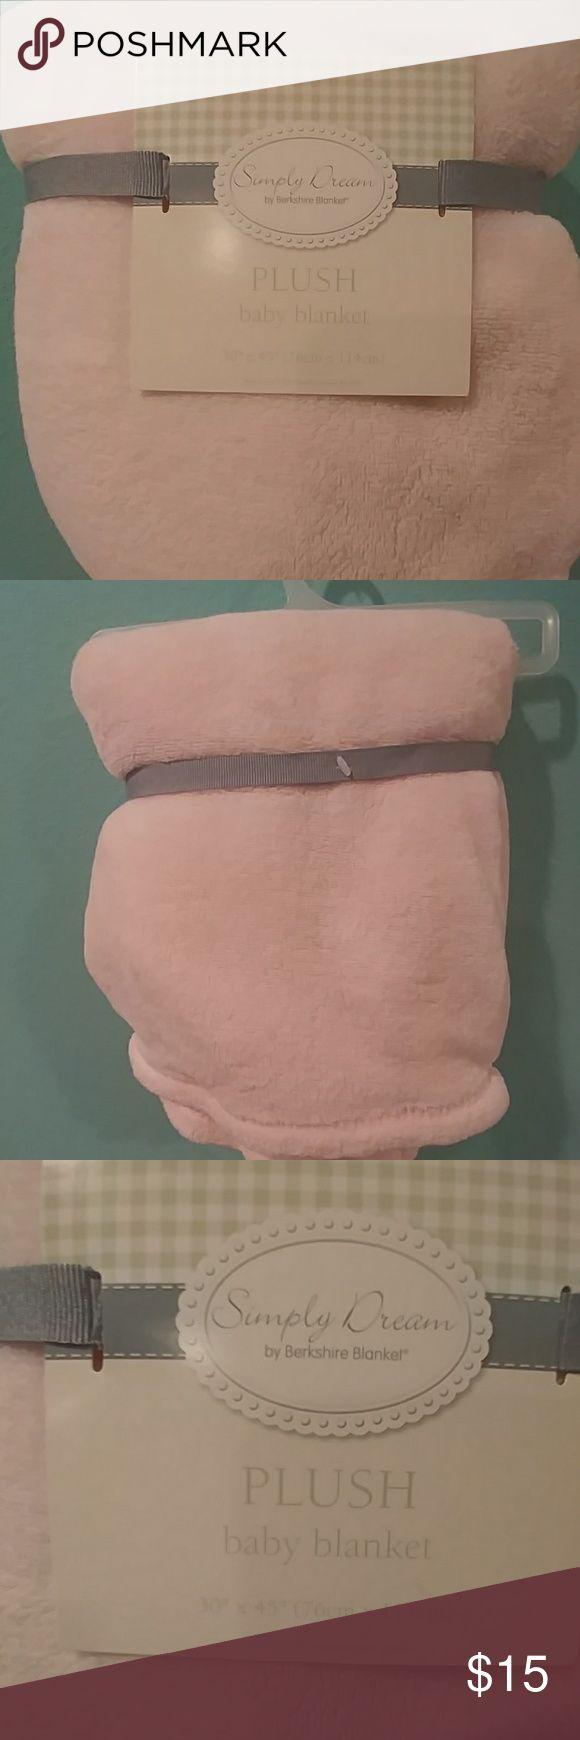 Plush light pink baby blanket by Berkshire blanket Brand new plush baby blanket Simply Dream Other